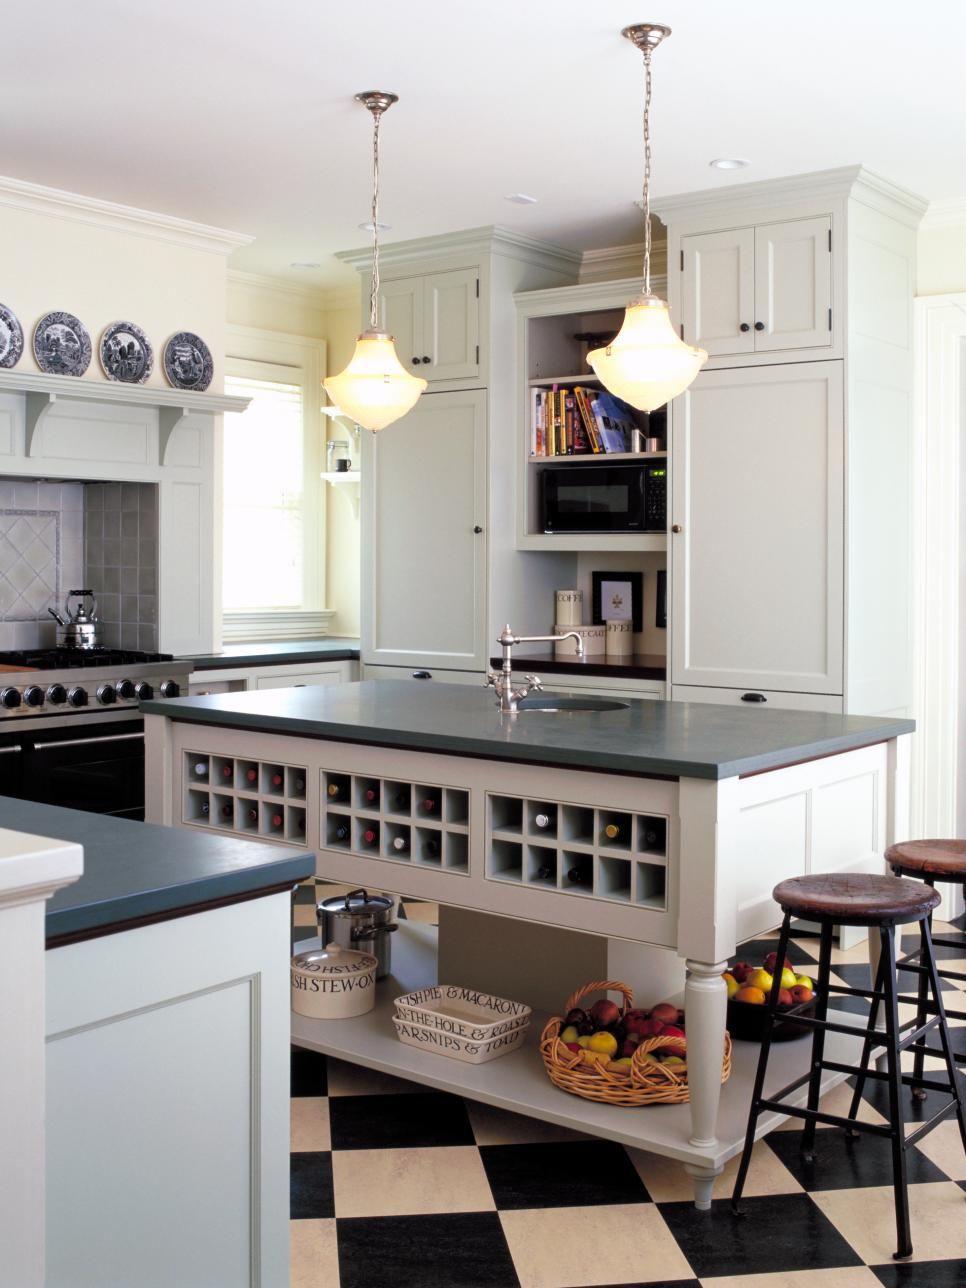 easy cheap diy kitchen cabinets ideas plan your own kitchen island storage diy kitchen on kitchen island ideas cheap id=25440